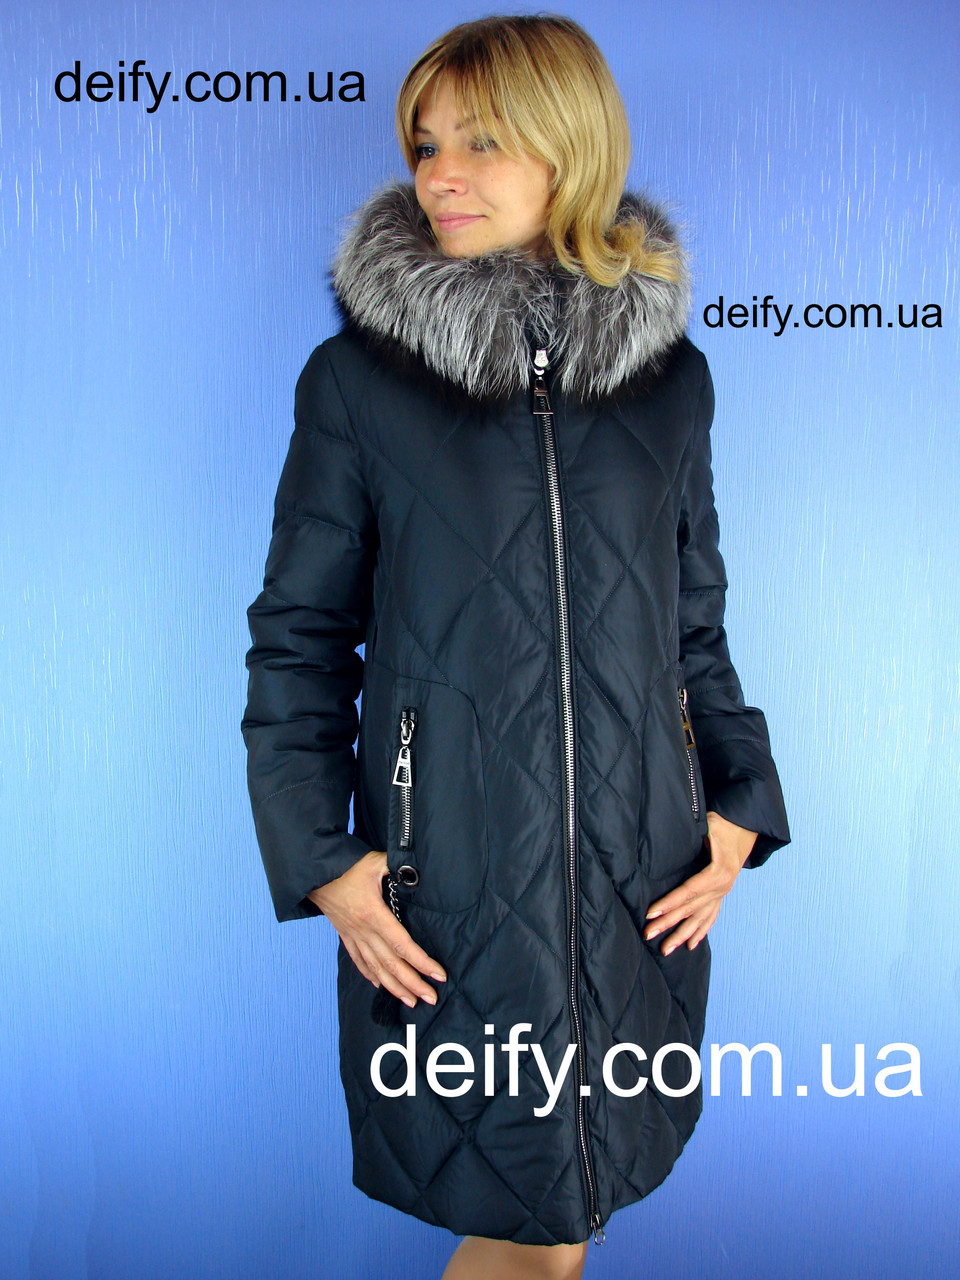 abee76dae Зимняя женская куртка на тинсулейте (48-56), Symonder 7119. Куртки ...